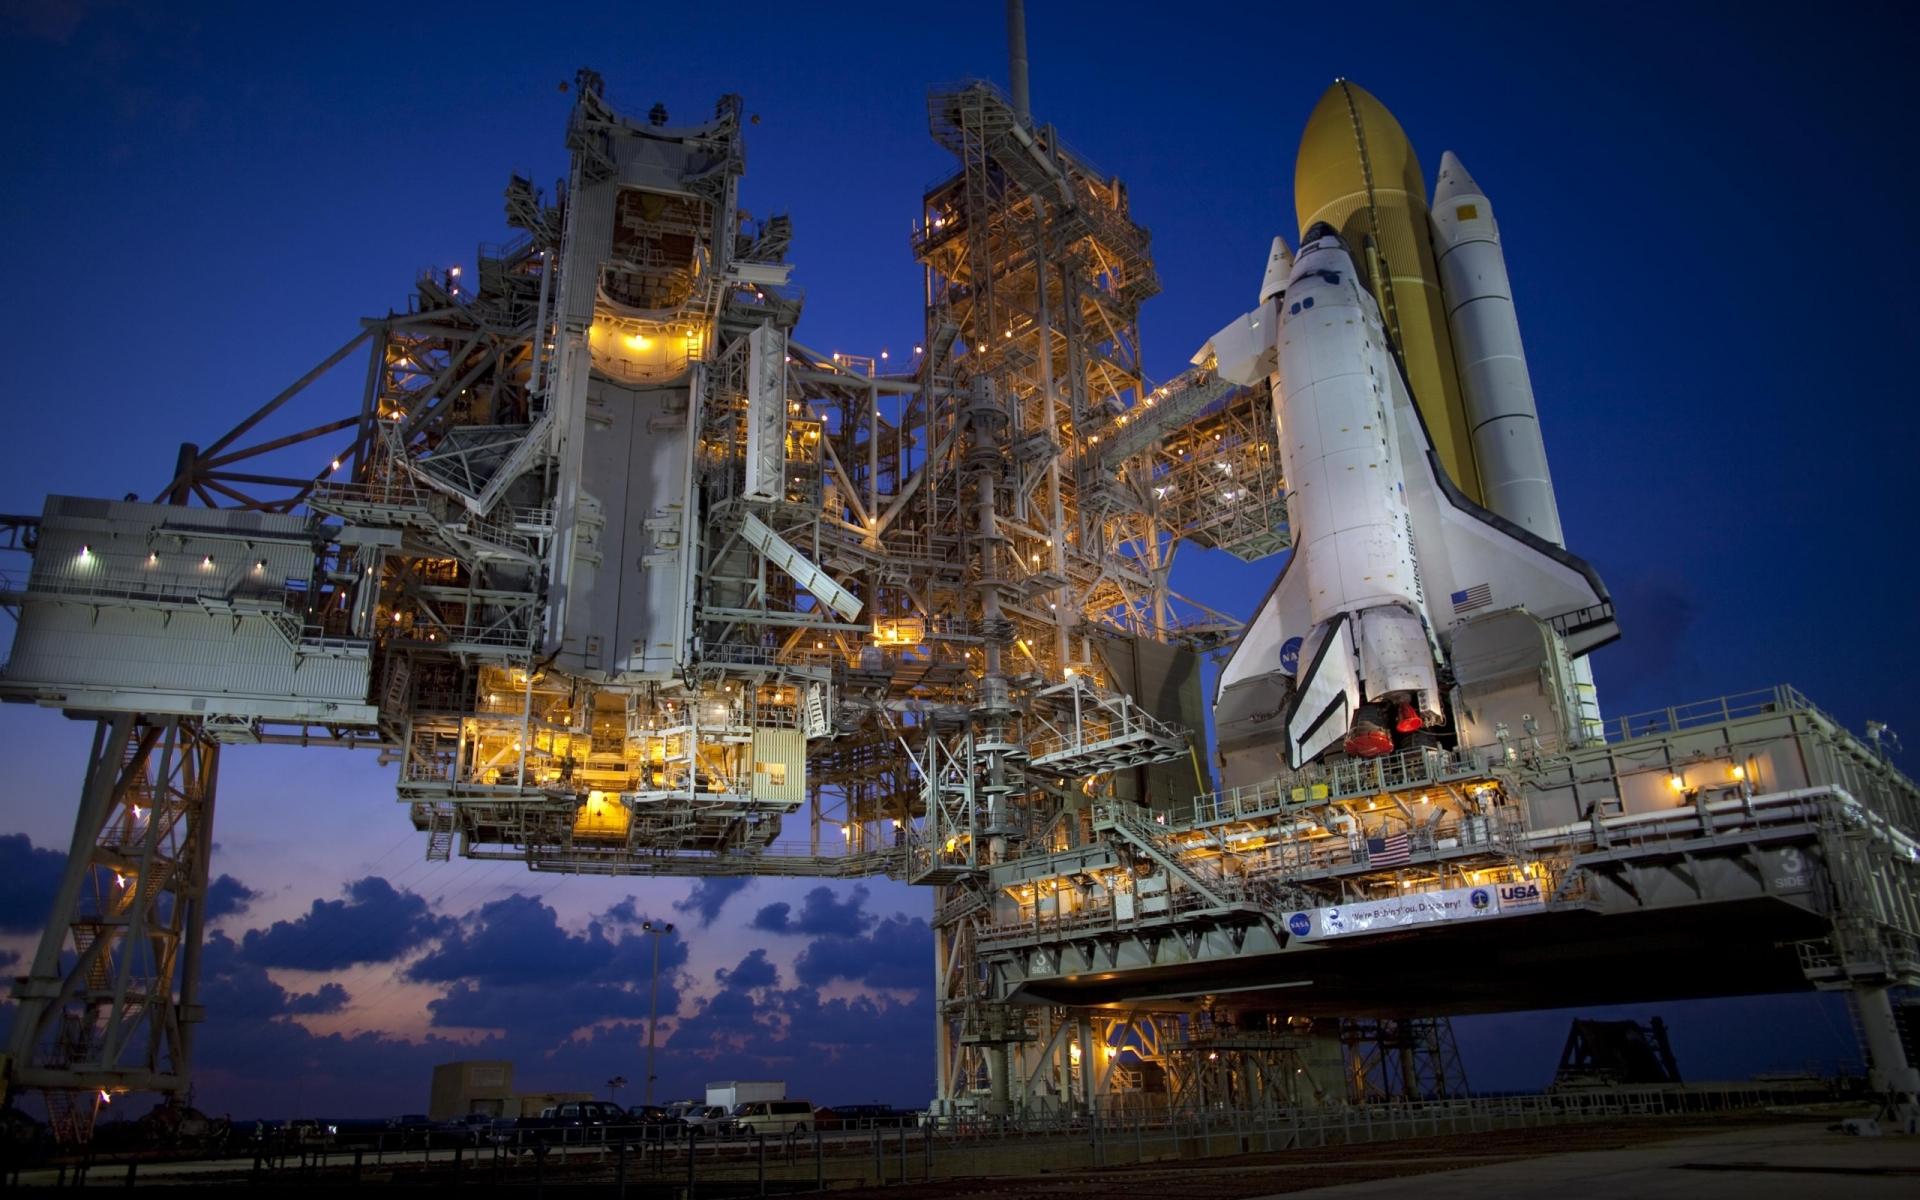 Space Shuttle Industry Nasa Wallpaper